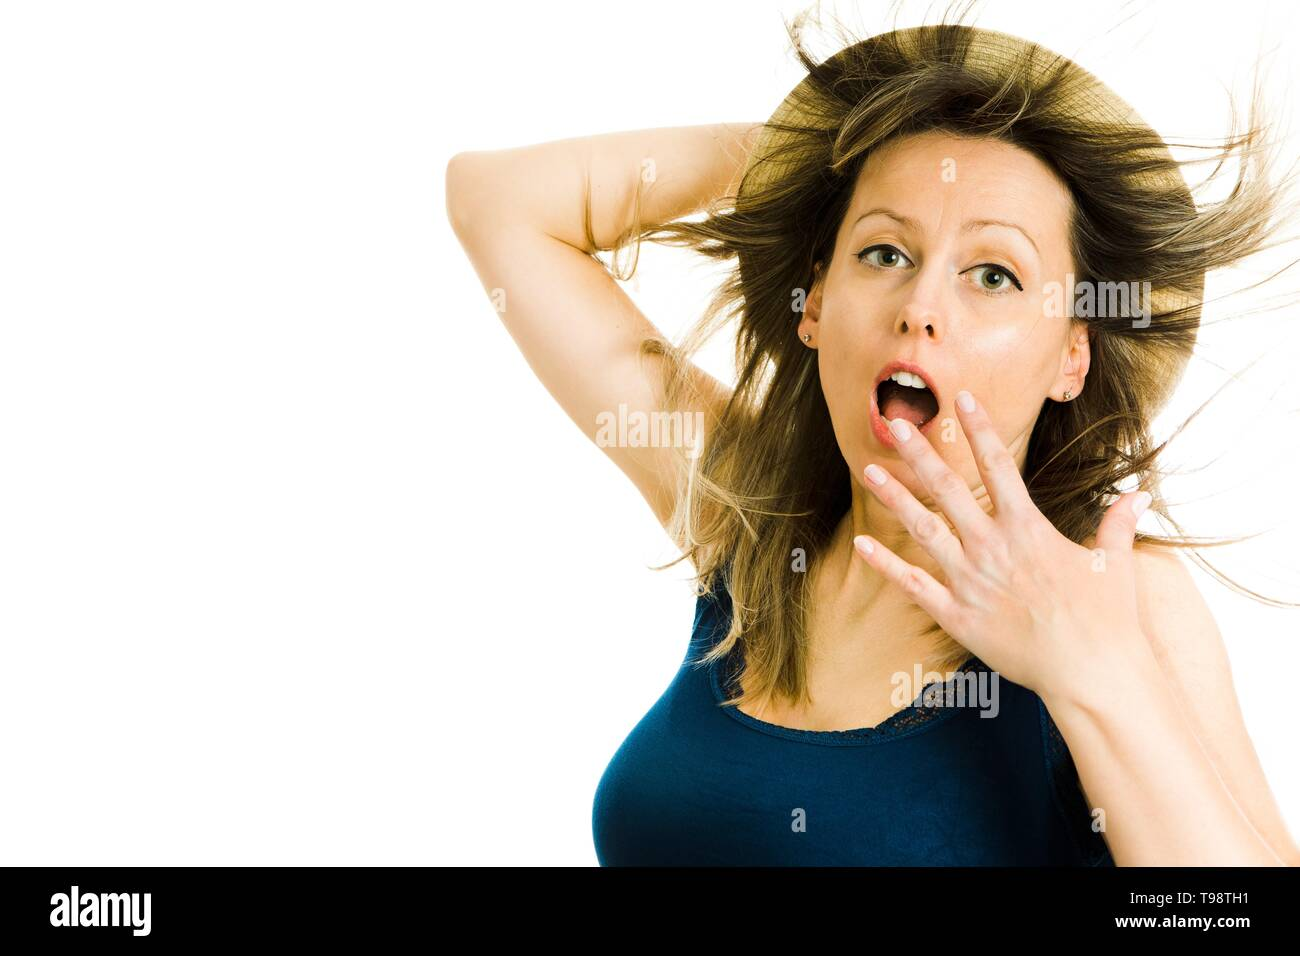 f4d02b770 Woman Singlet Stock Photos & Woman Singlet Stock Images - Alamy